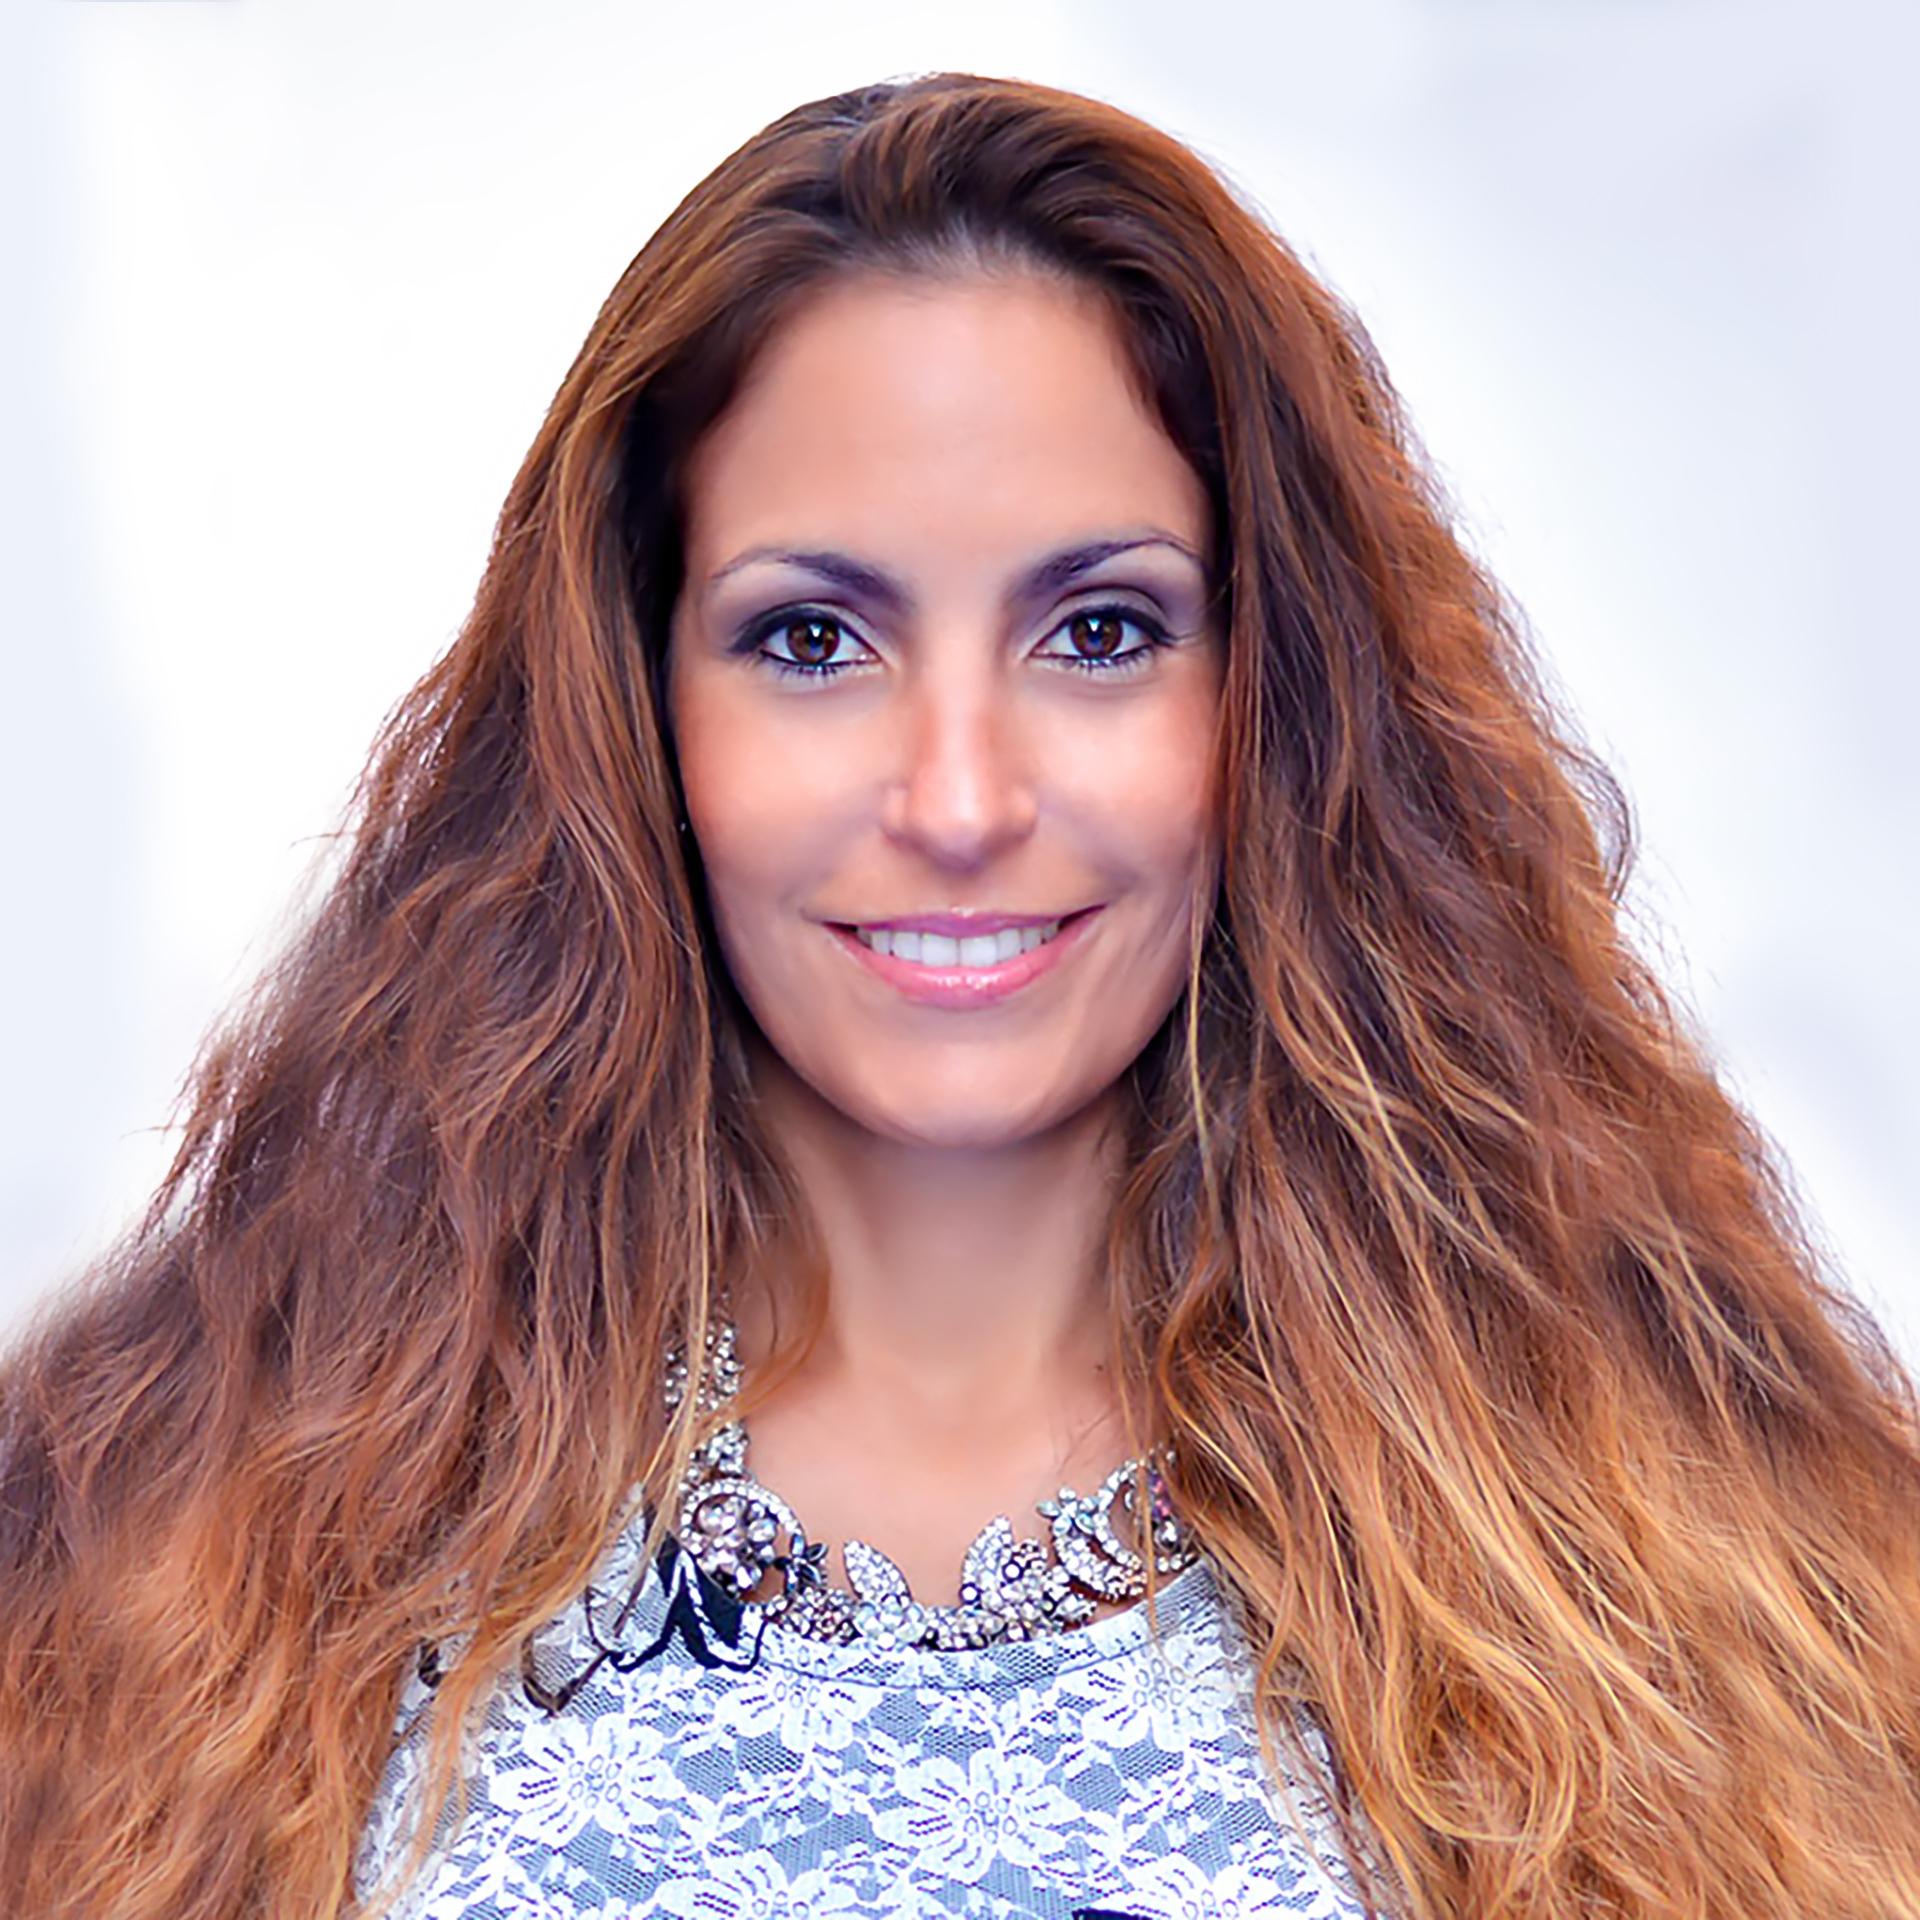 Ariana Soffici Style www.arianasoffici.com